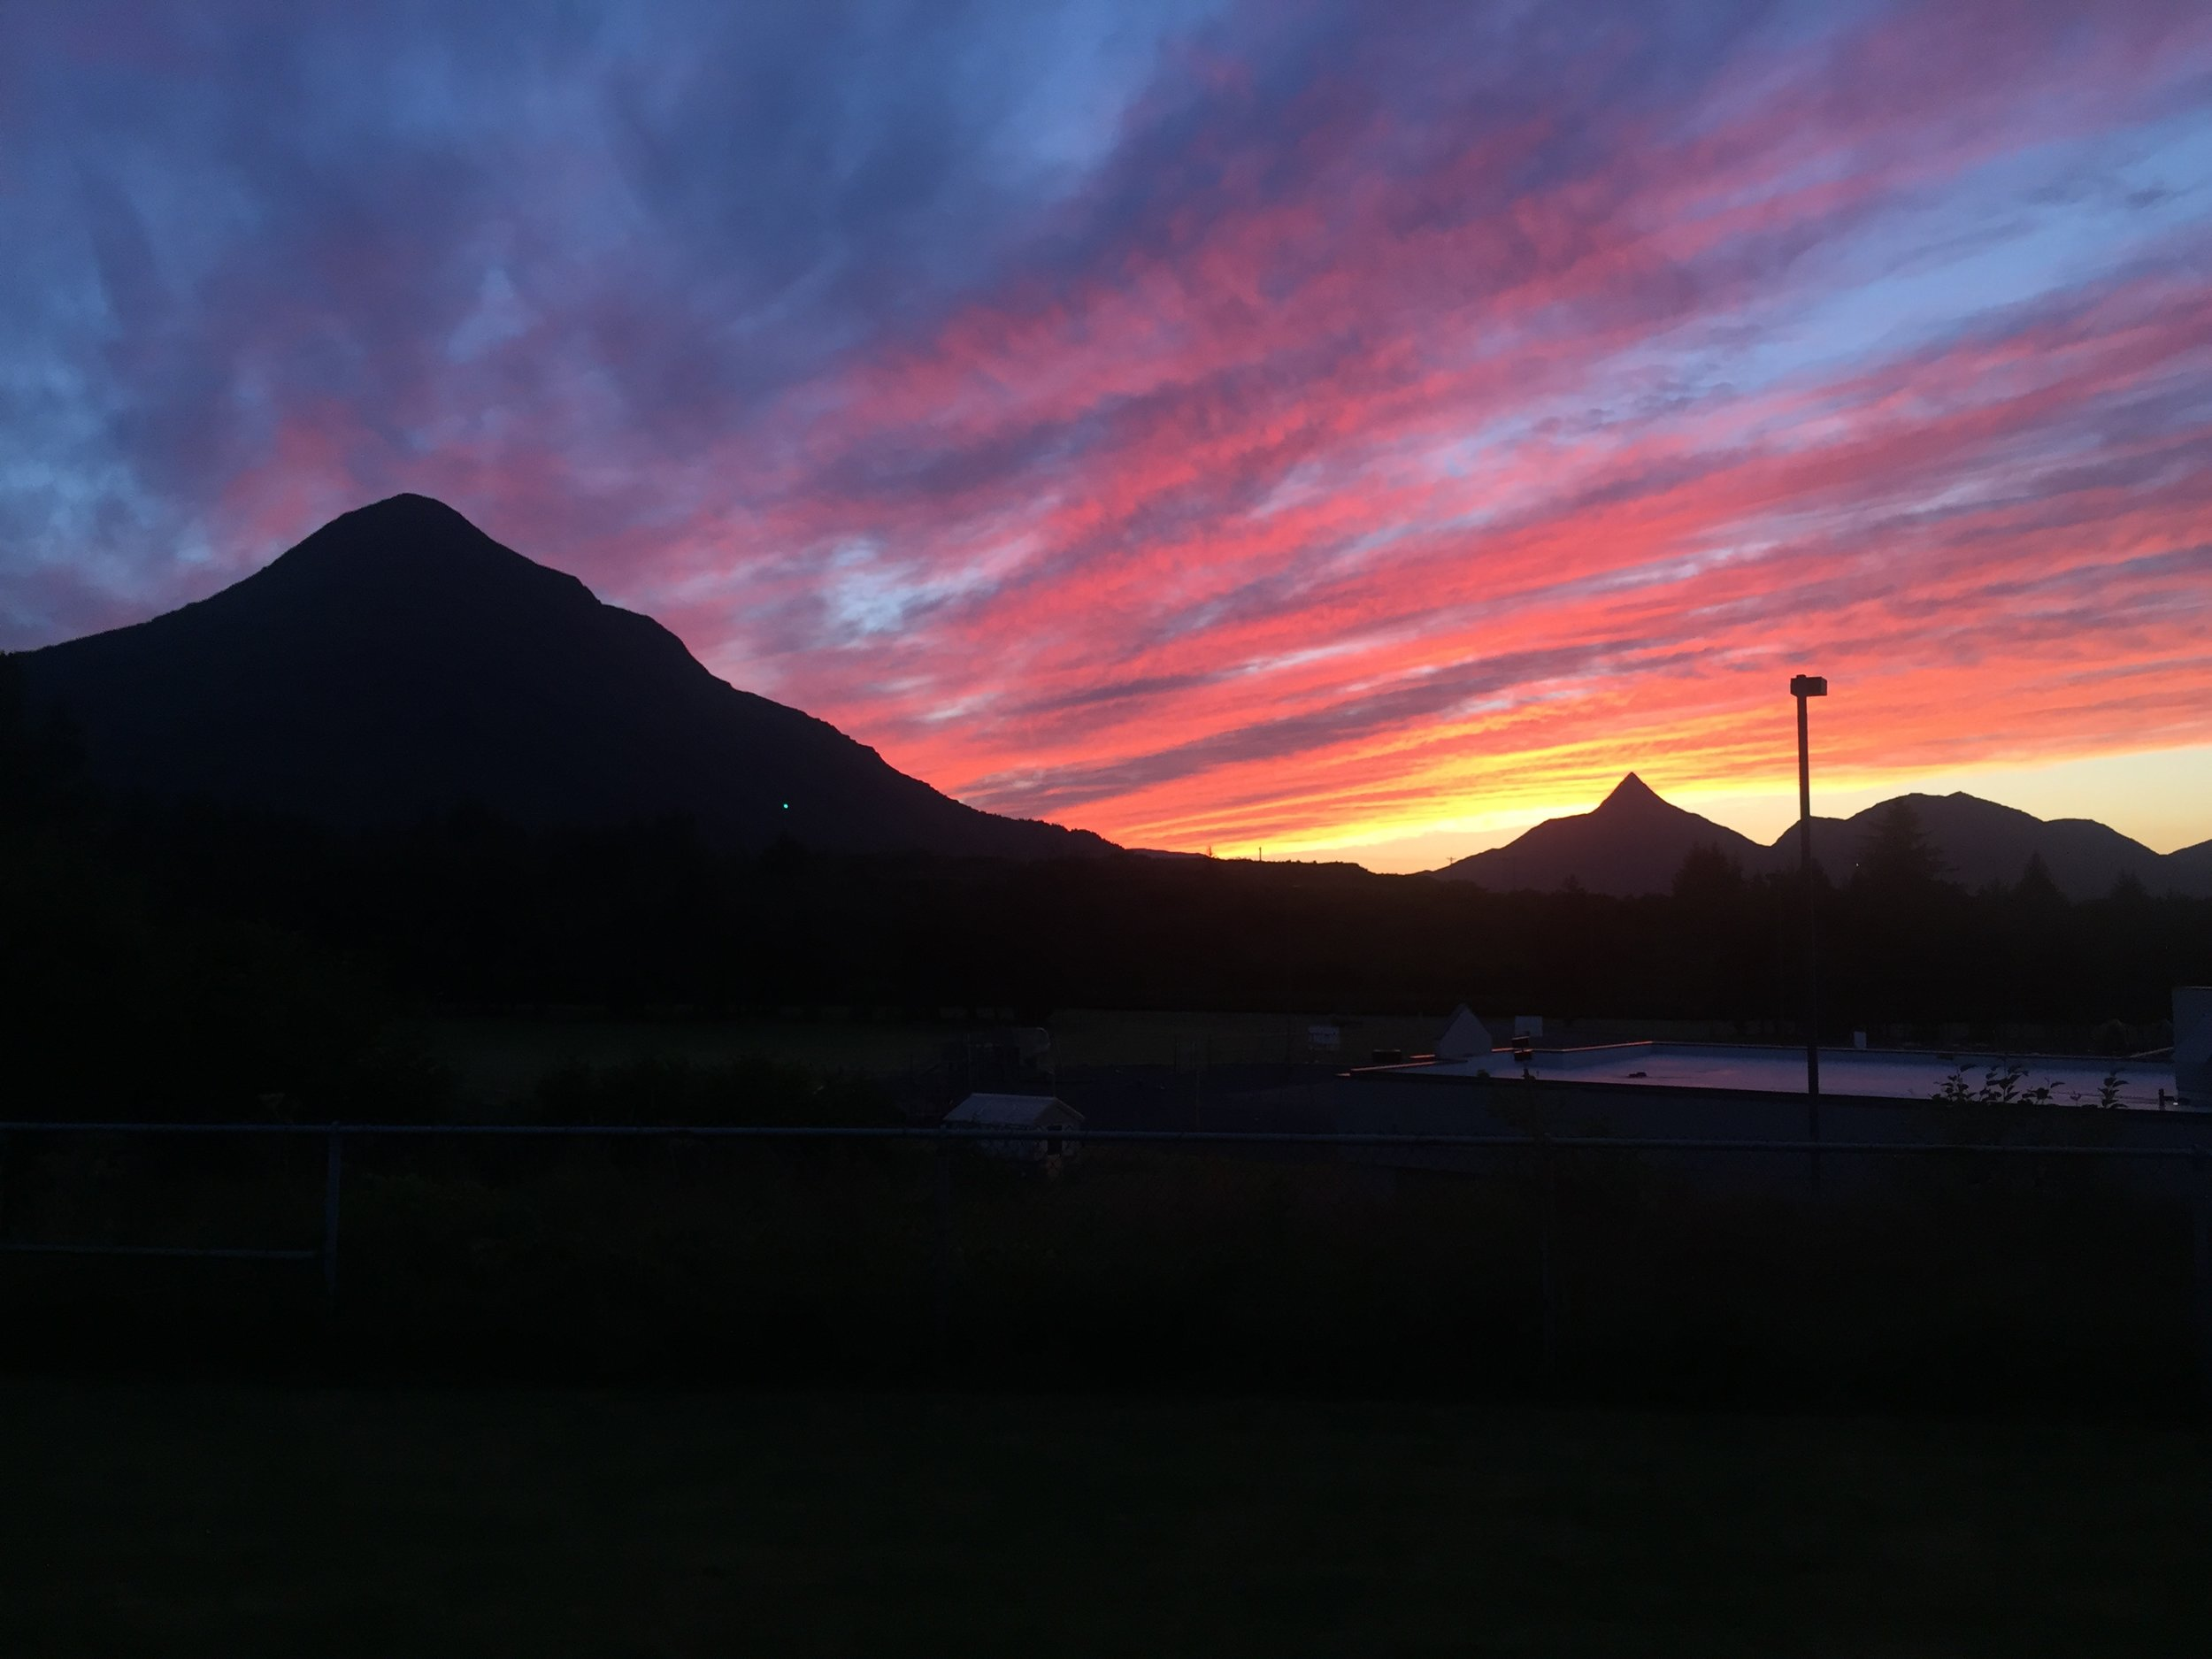 Sunset @Barometer Mountain Kodiak, AK